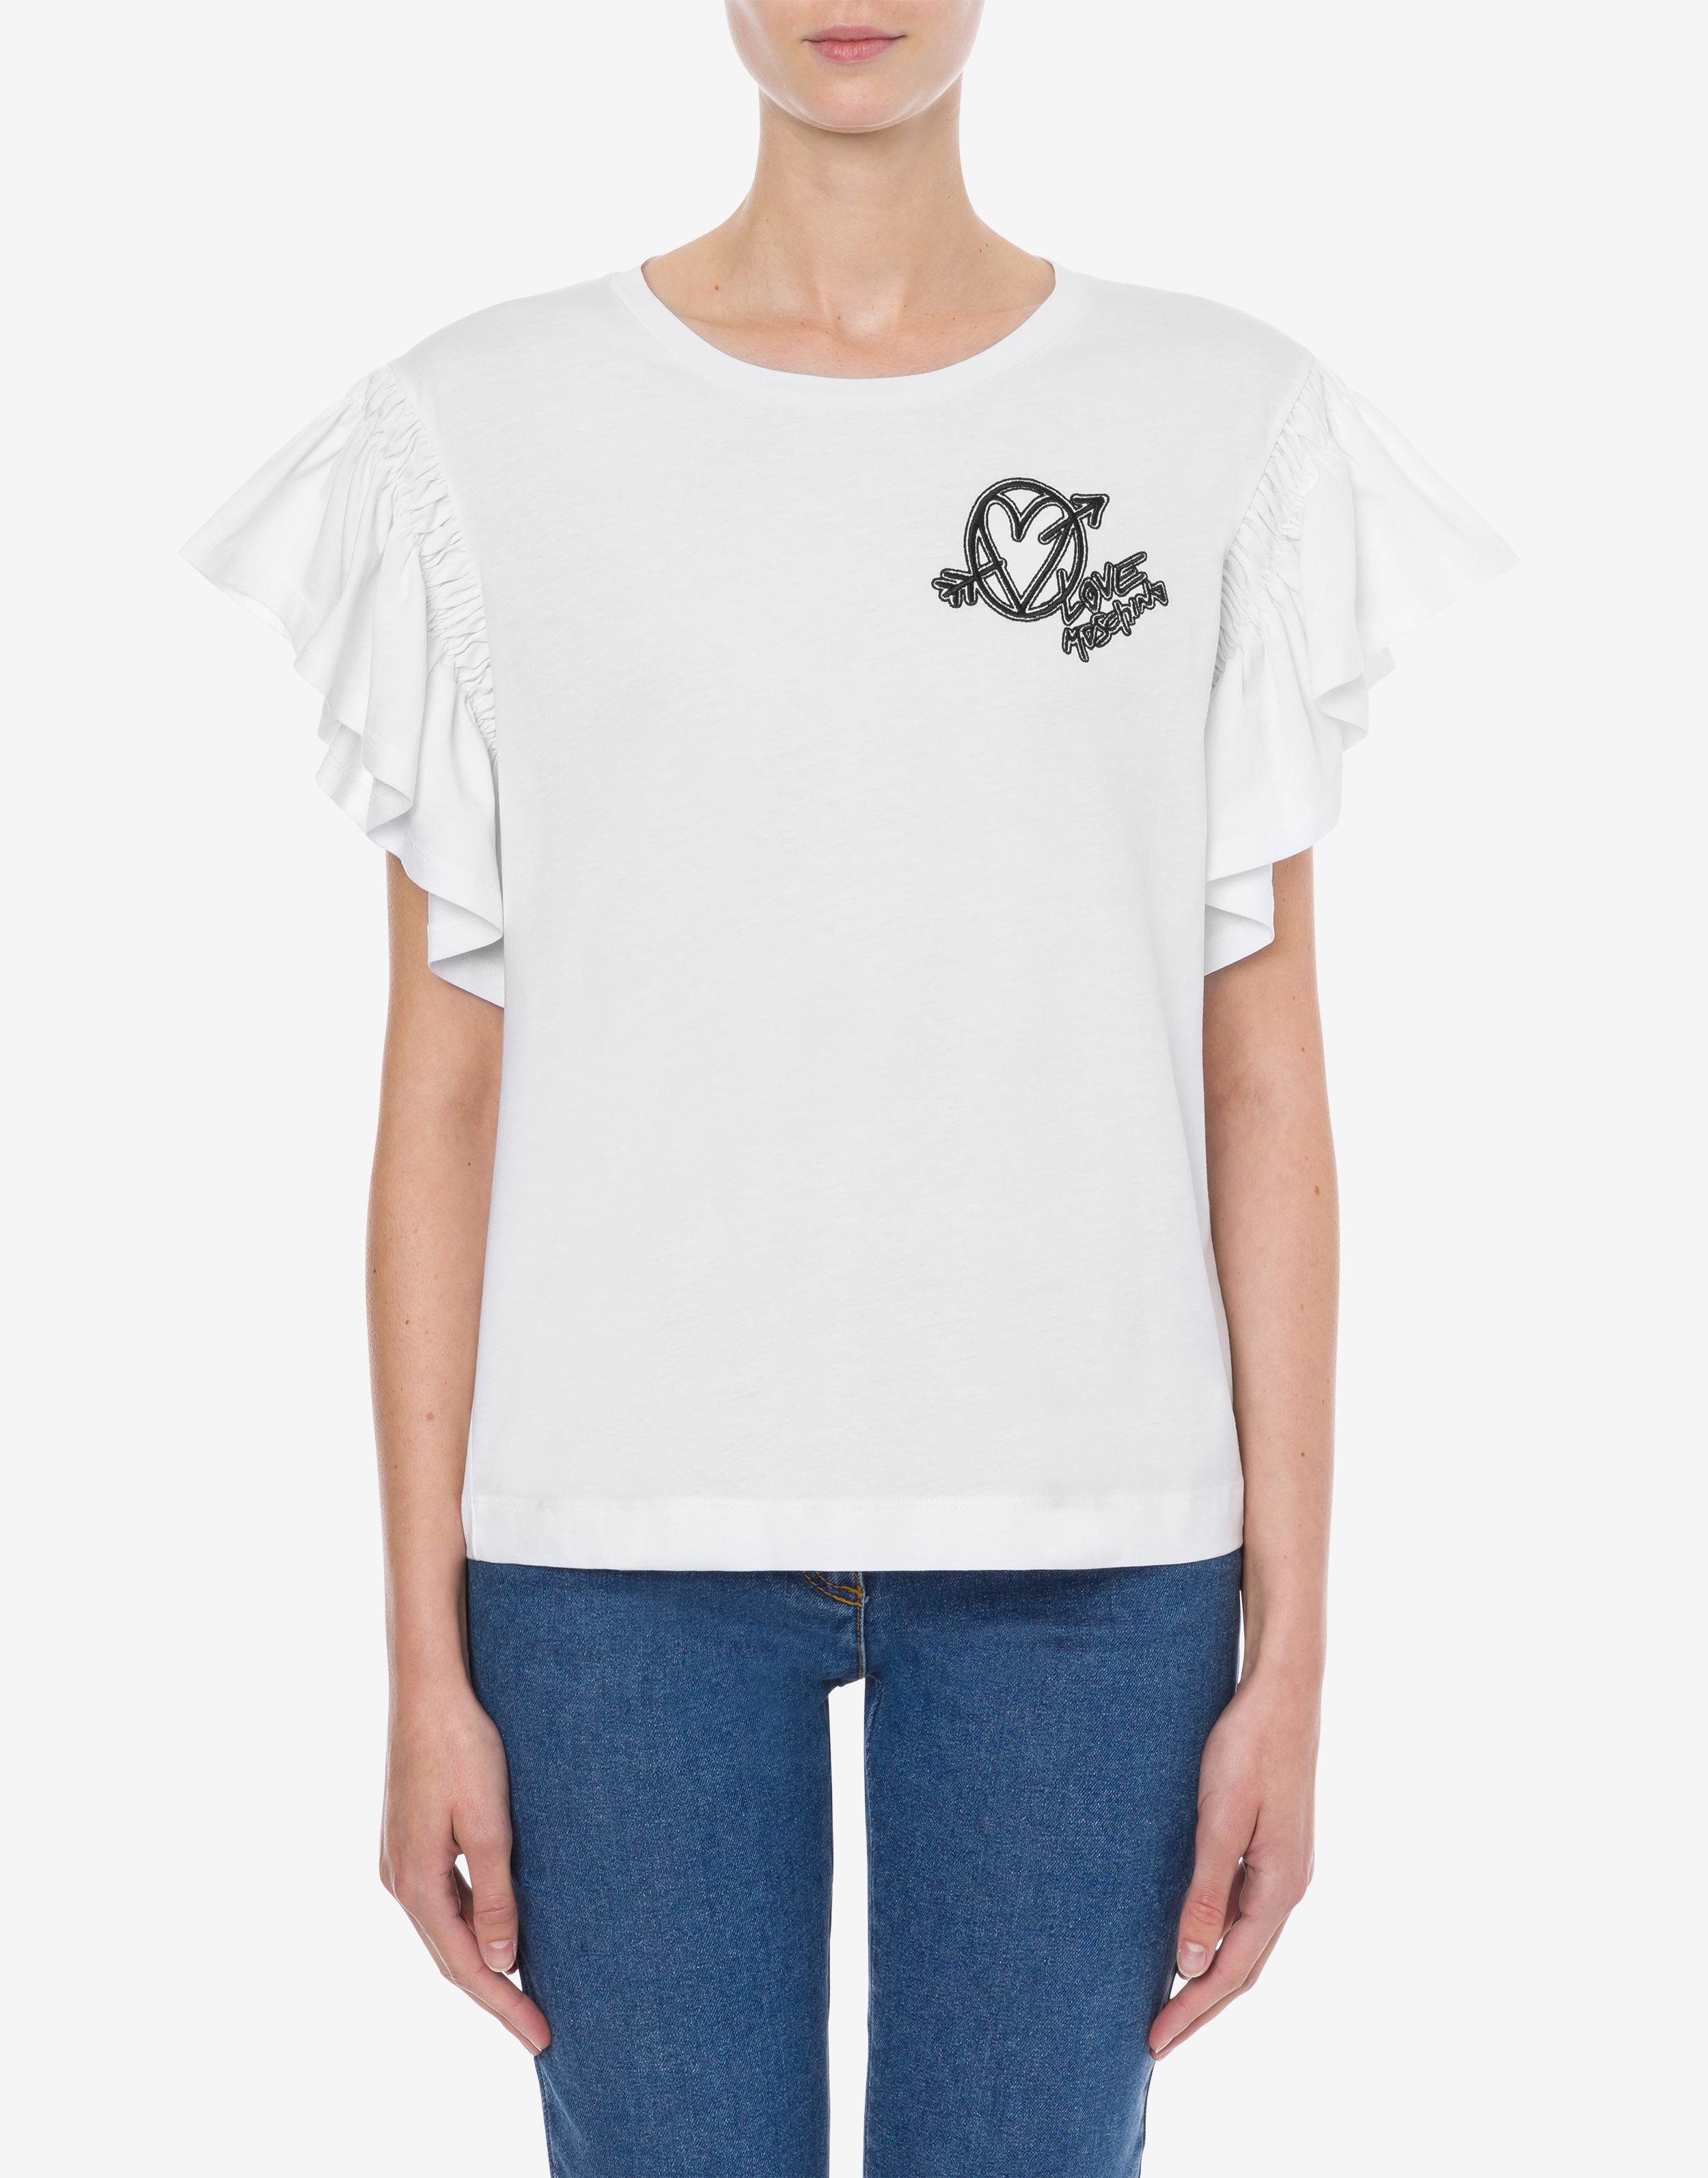 LOVE MOSCHINO | T-Shirts | W4H41 01 M3876A00